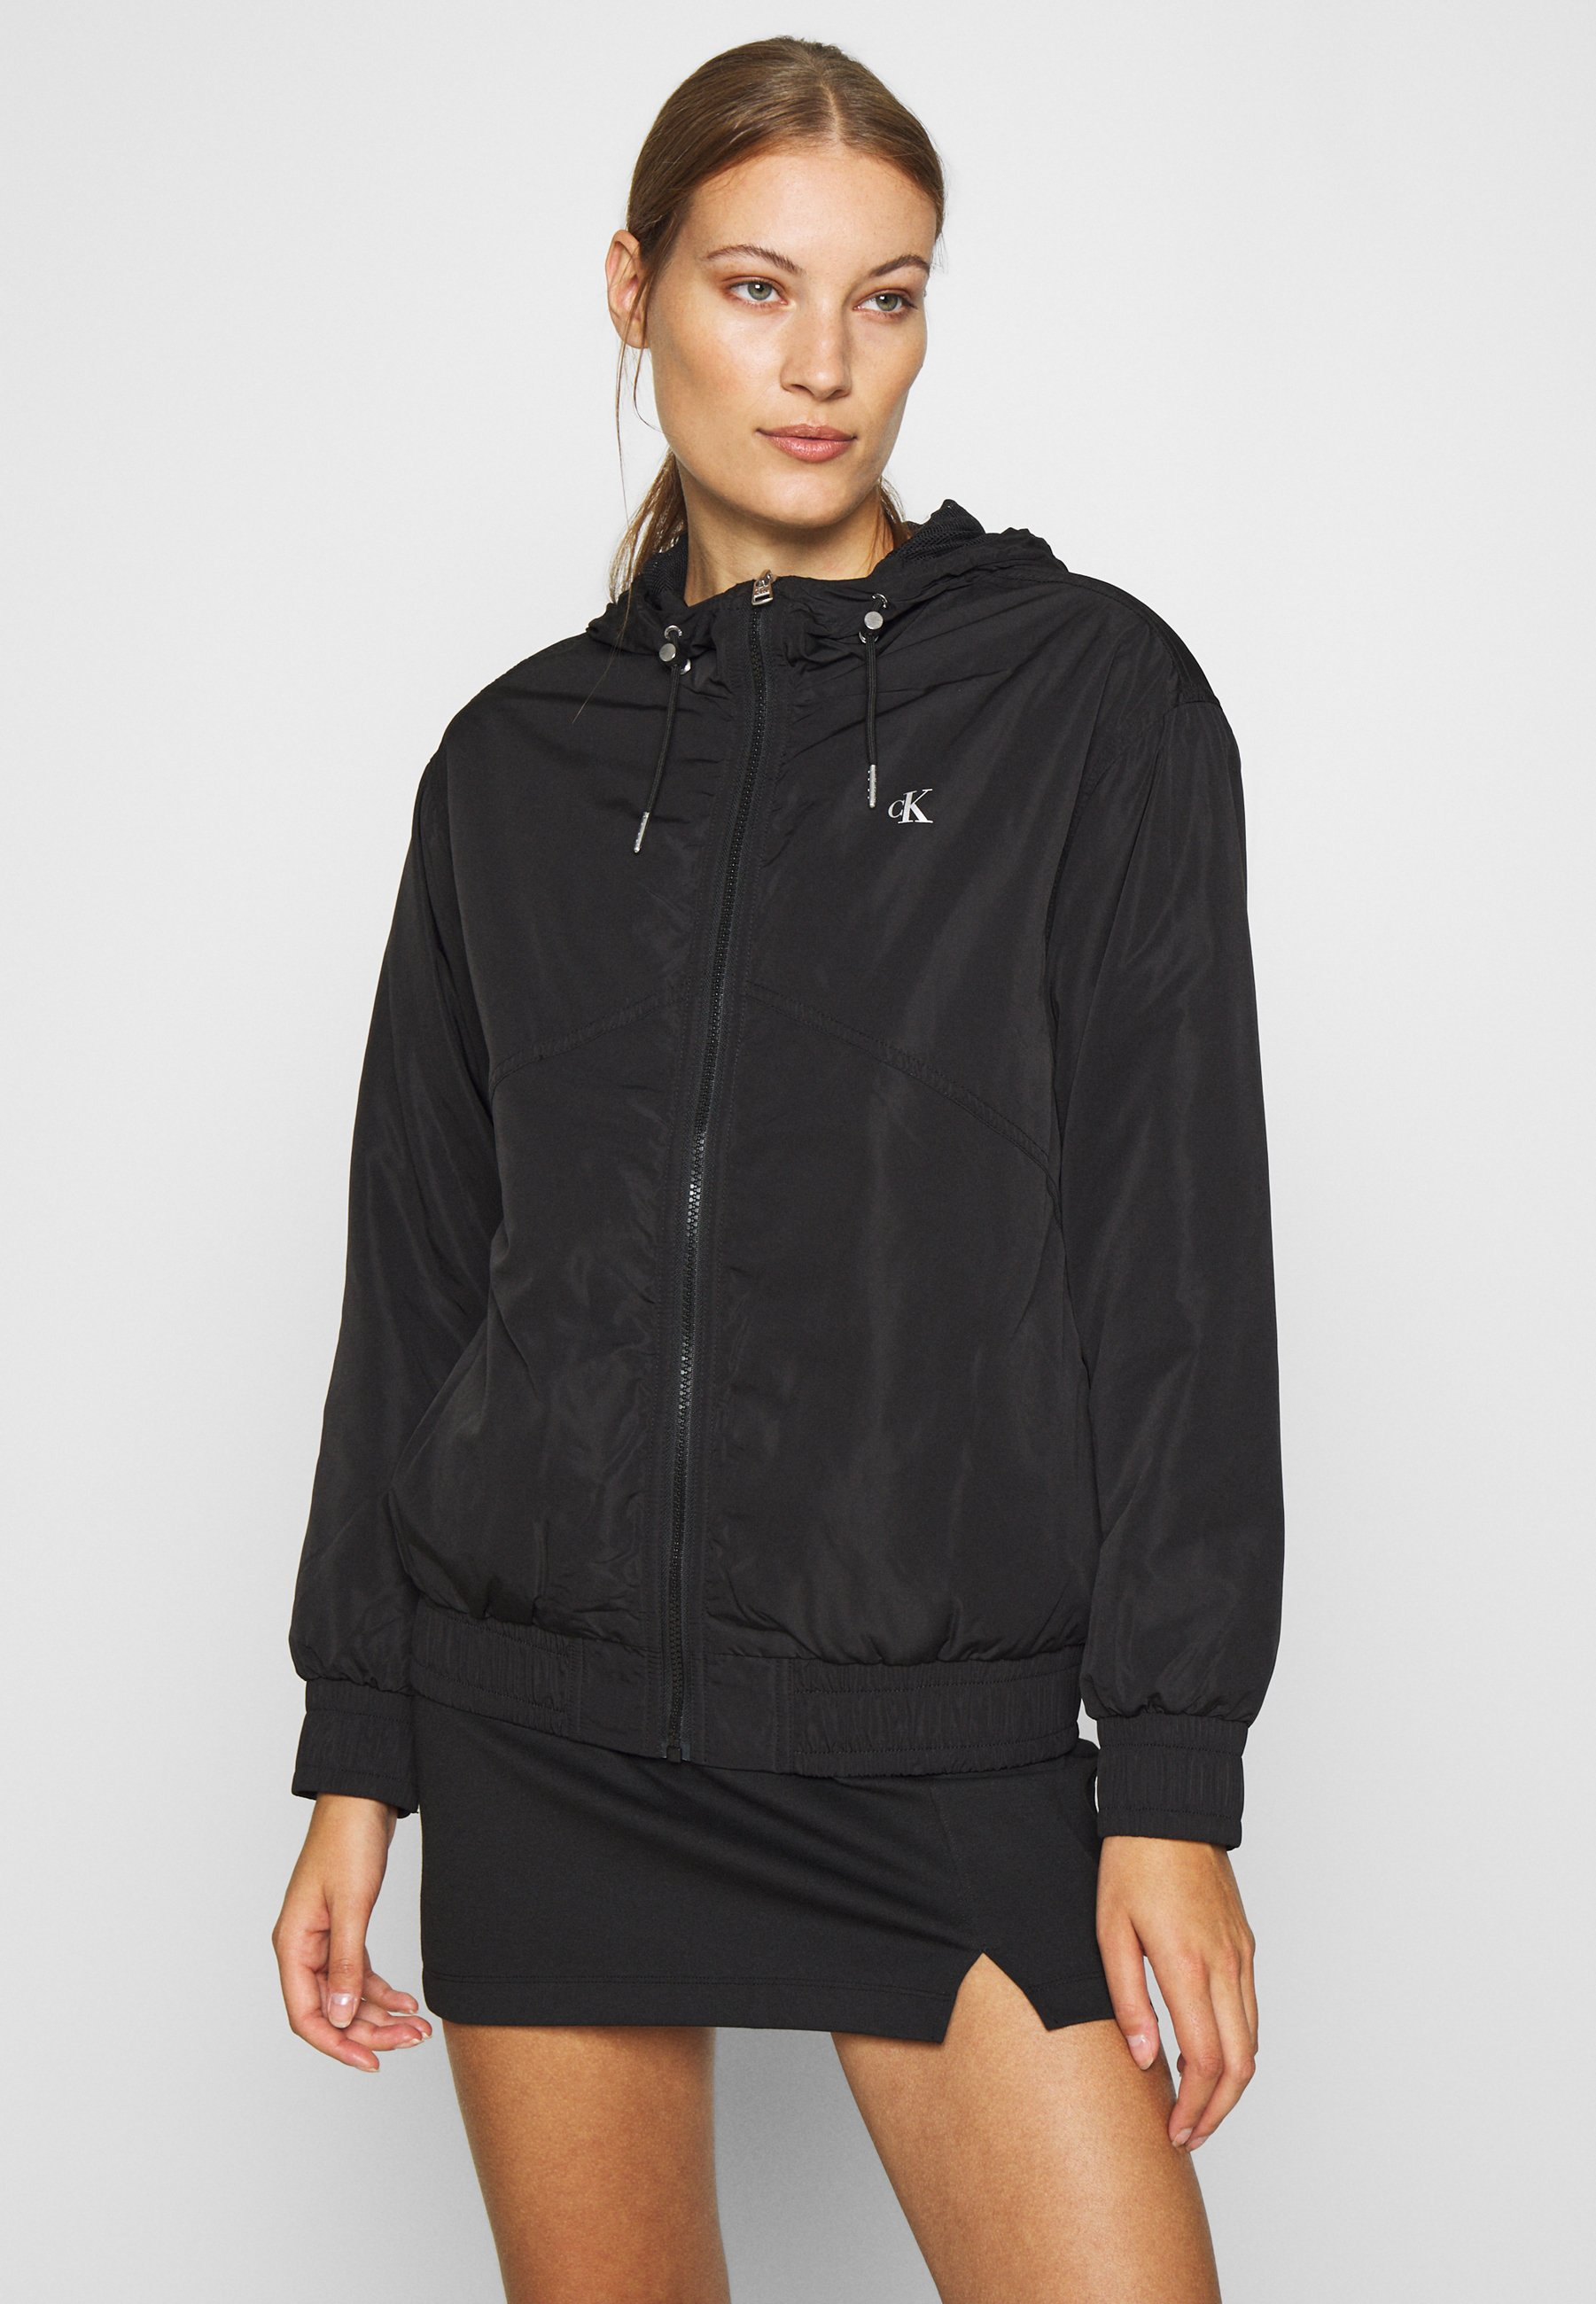 2020 New Visit New Women's Clothing Calvin Klein Jeans Light jacket black yhSmJMOgf Ul0yixeSy